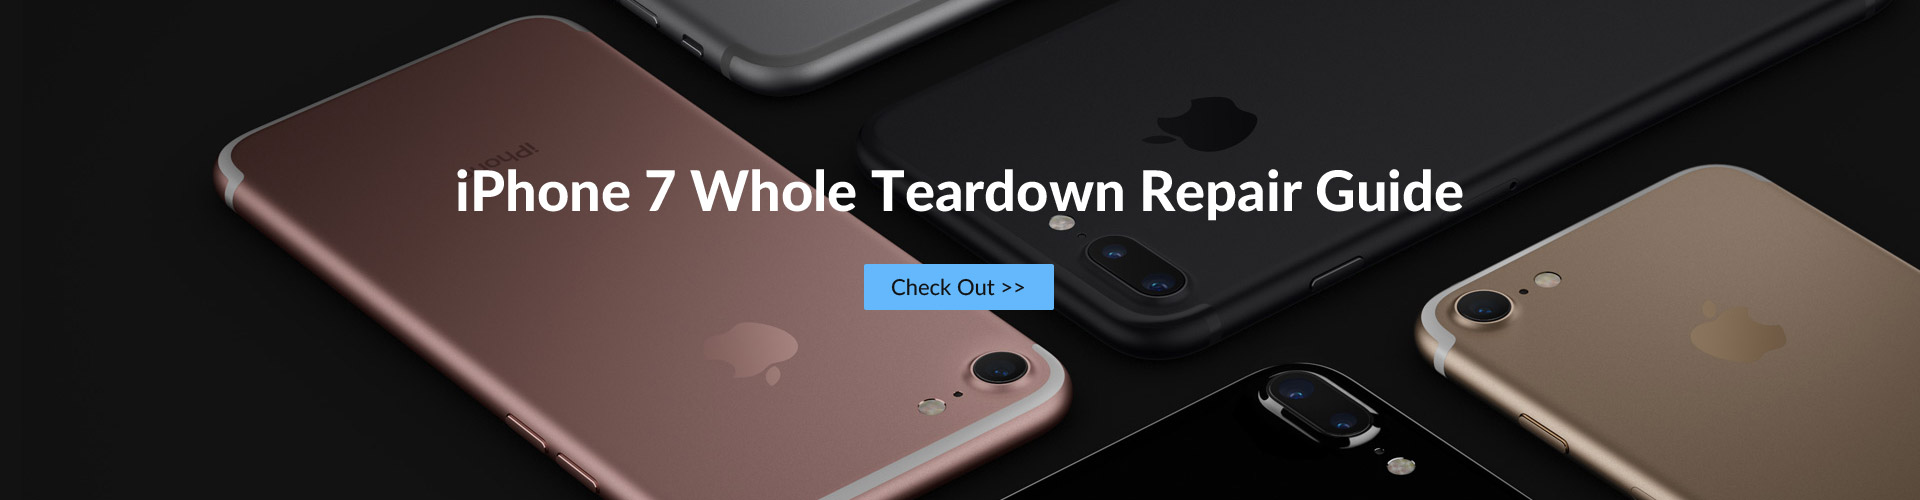 iPhone 7-teardown-repair-guide